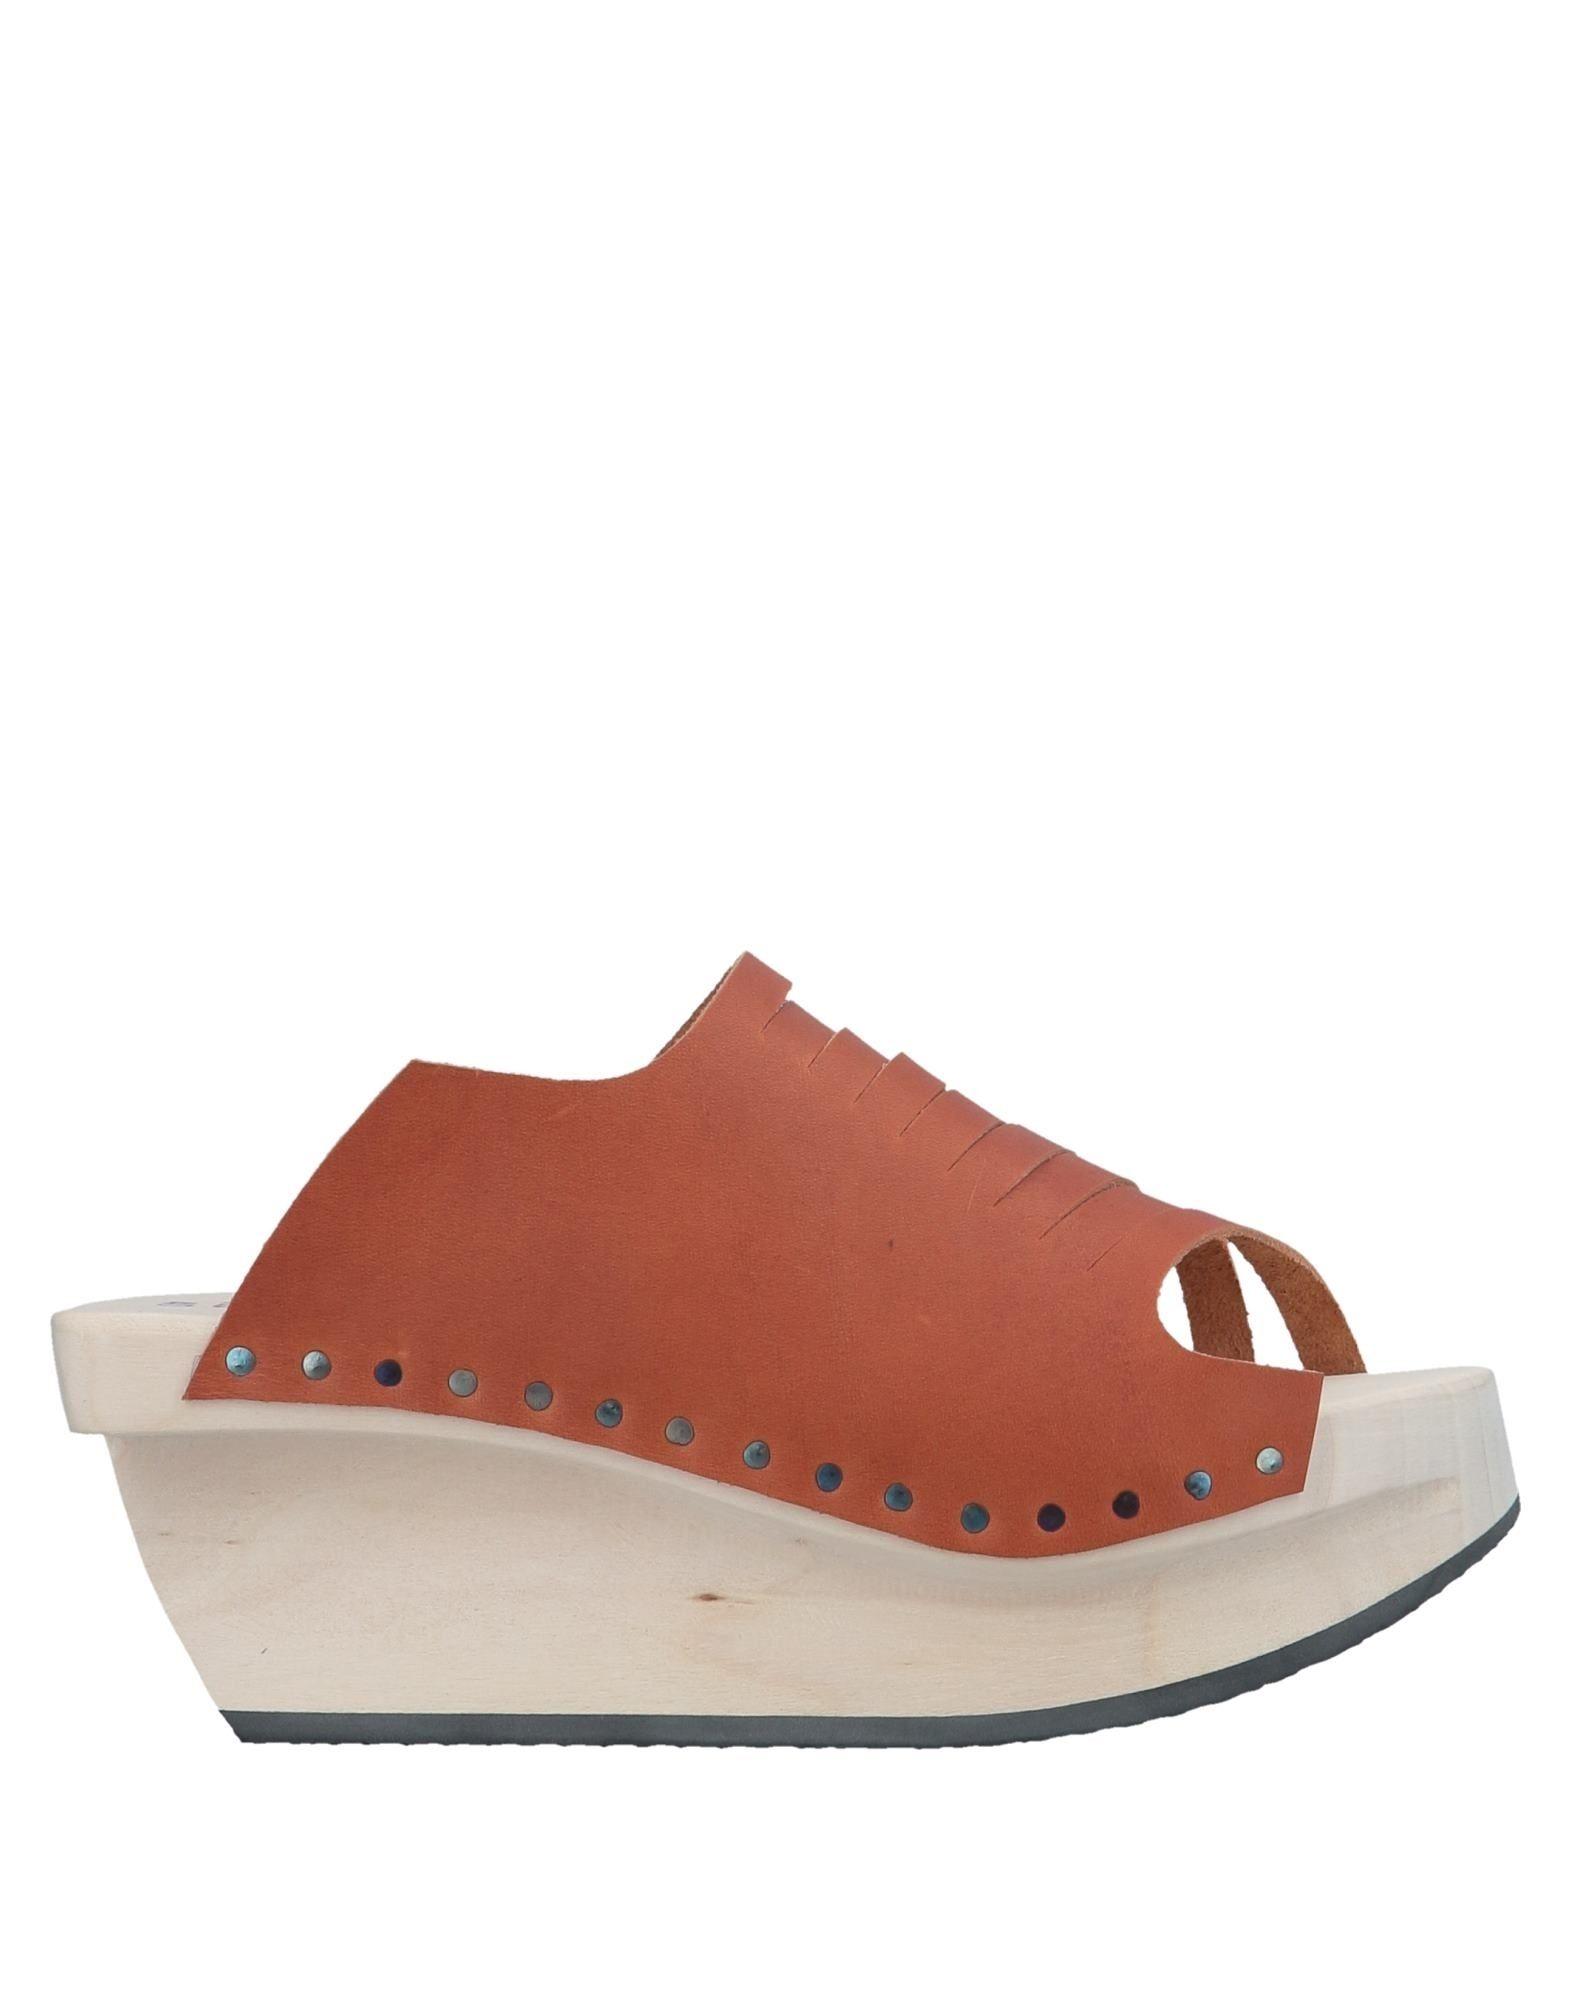 Trippen Sandals - Women Trippen Sandals online 11579663UR on  Australia - 11579663UR online 72b708